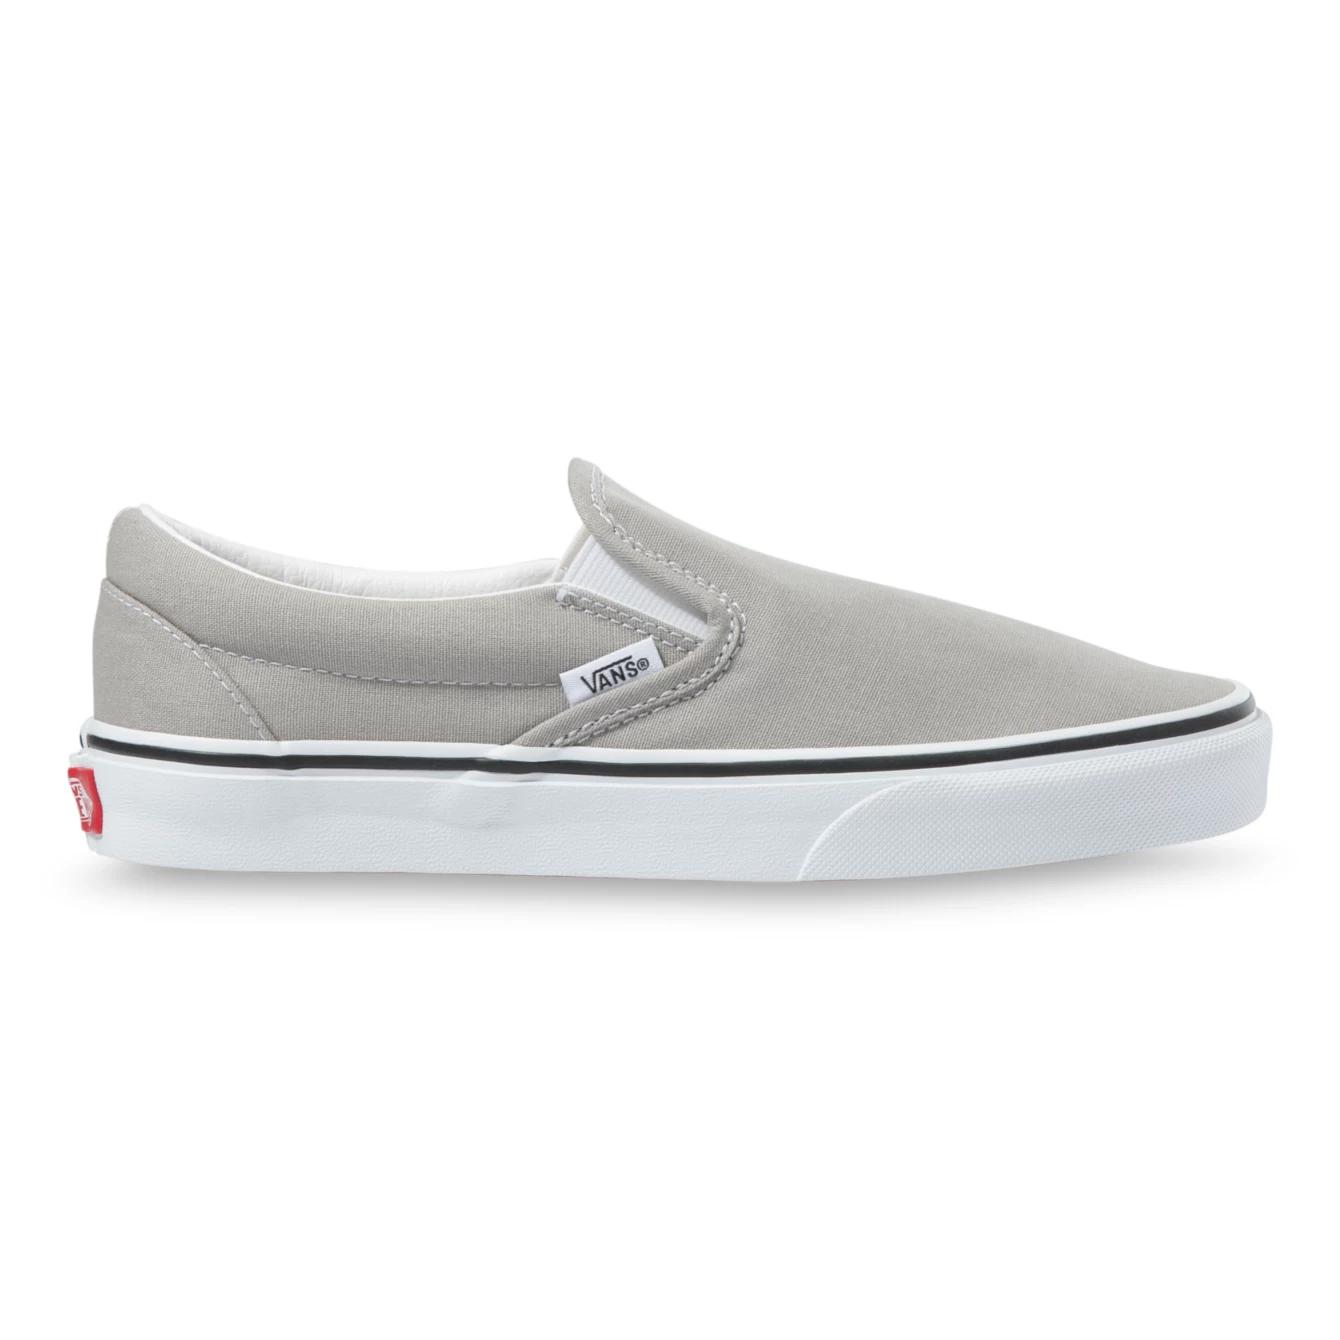 Vans Classic Slip-On Drizzle/True White Shoes